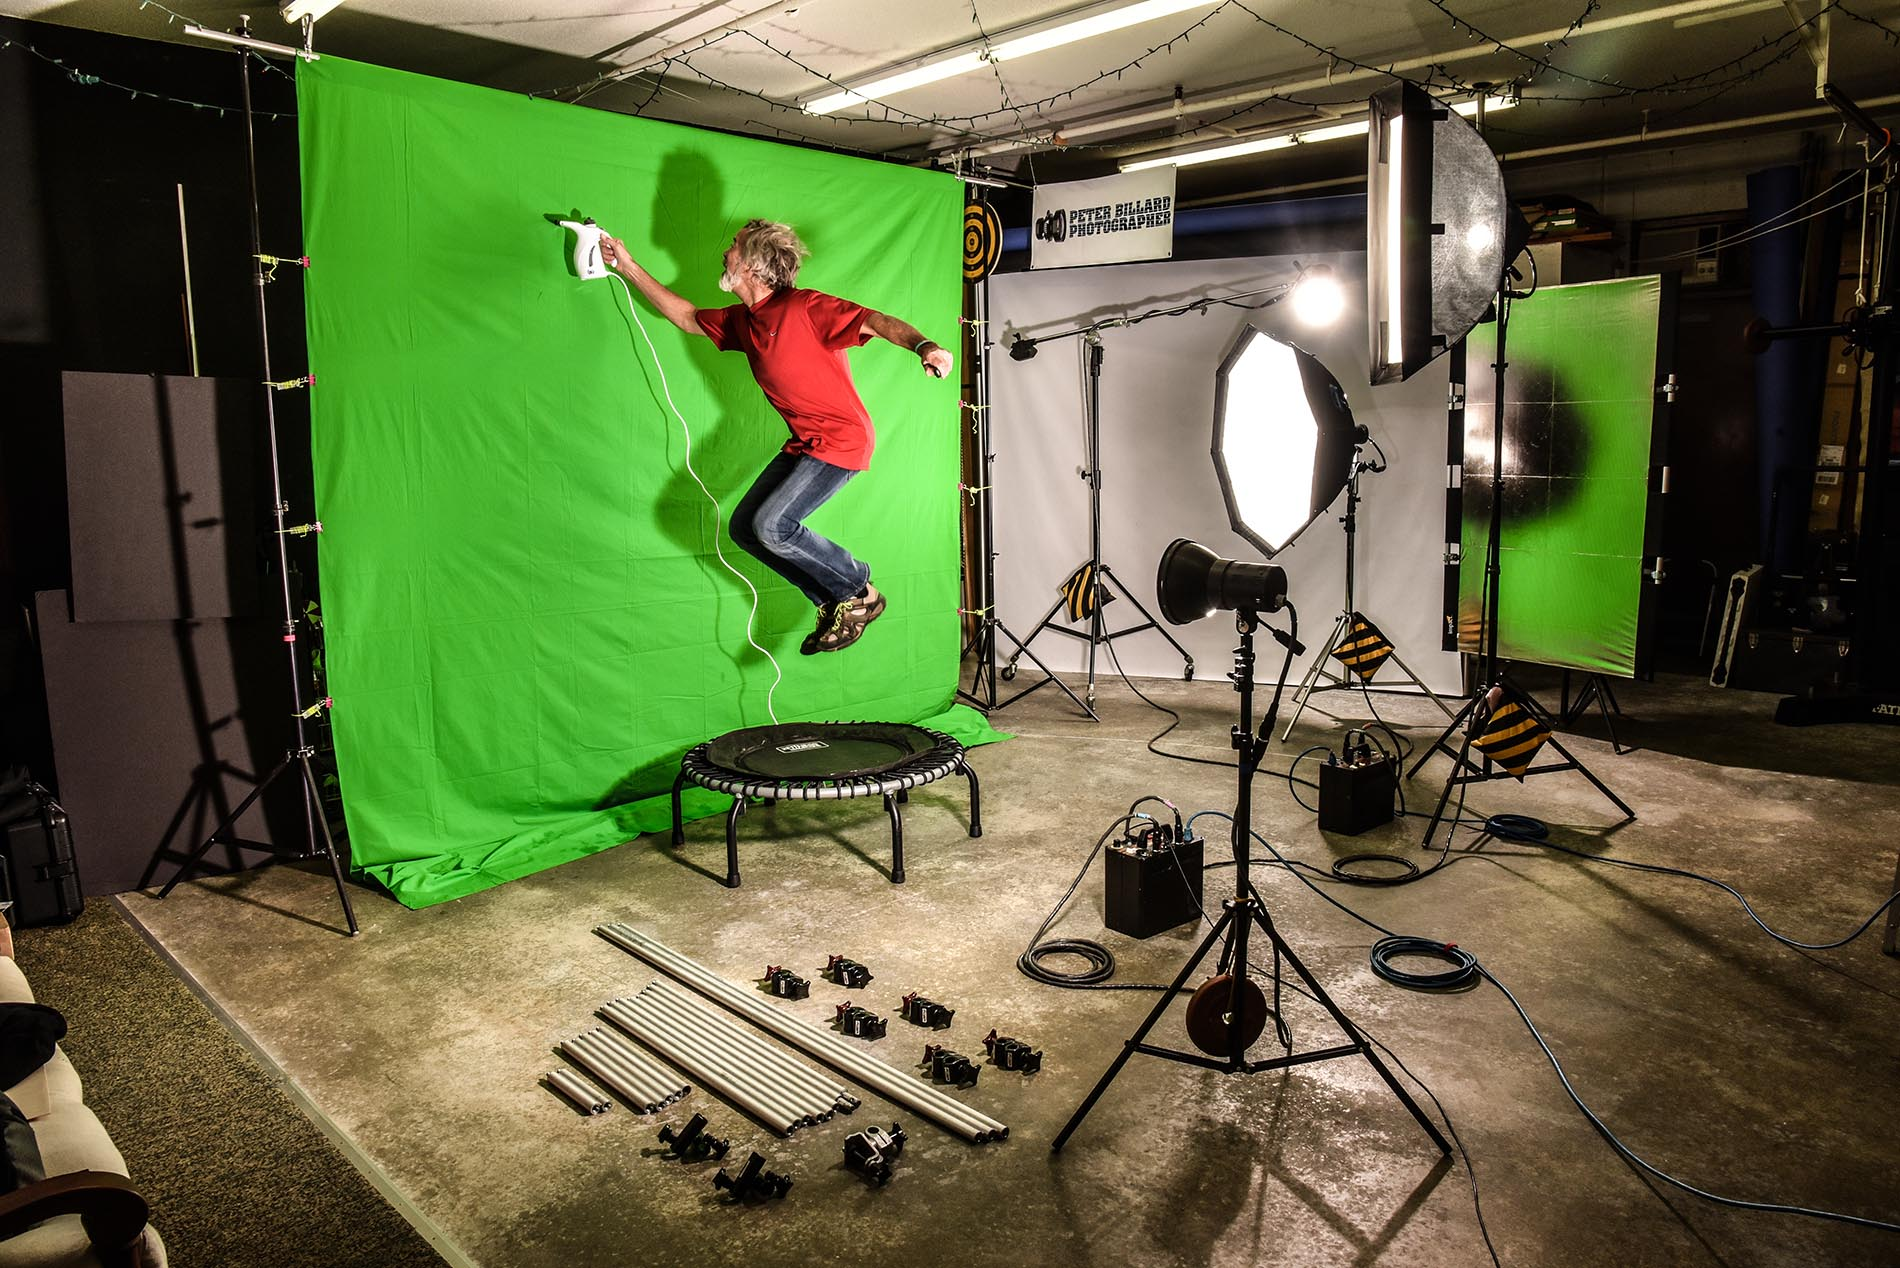 Studio behind the scenes steamer & green screen